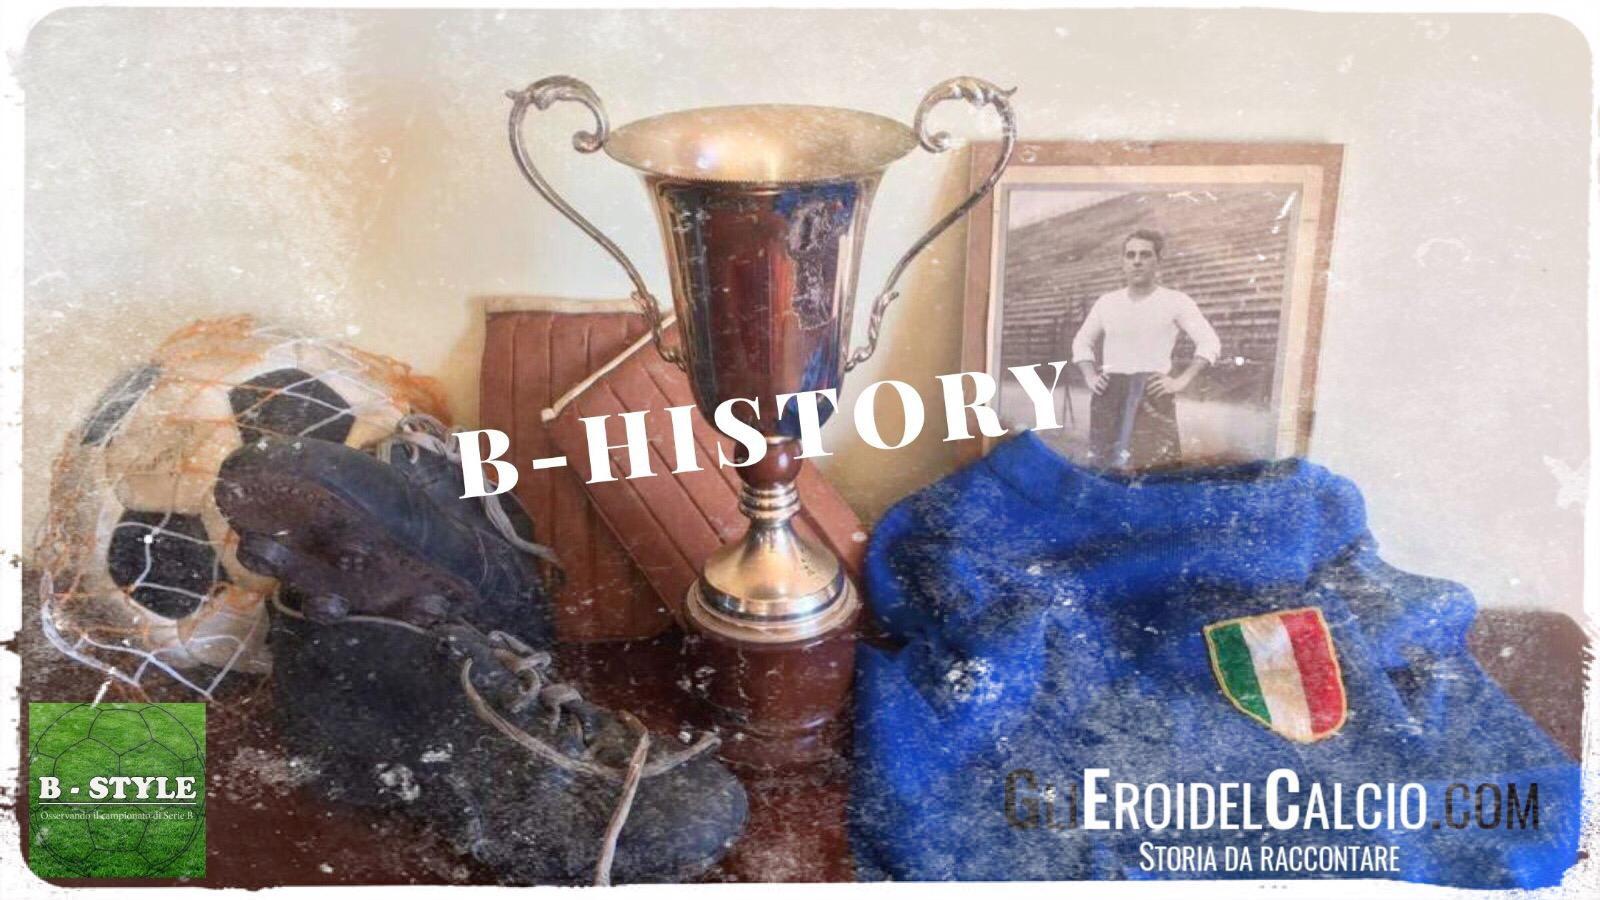 b-history EROIDELCALCIO